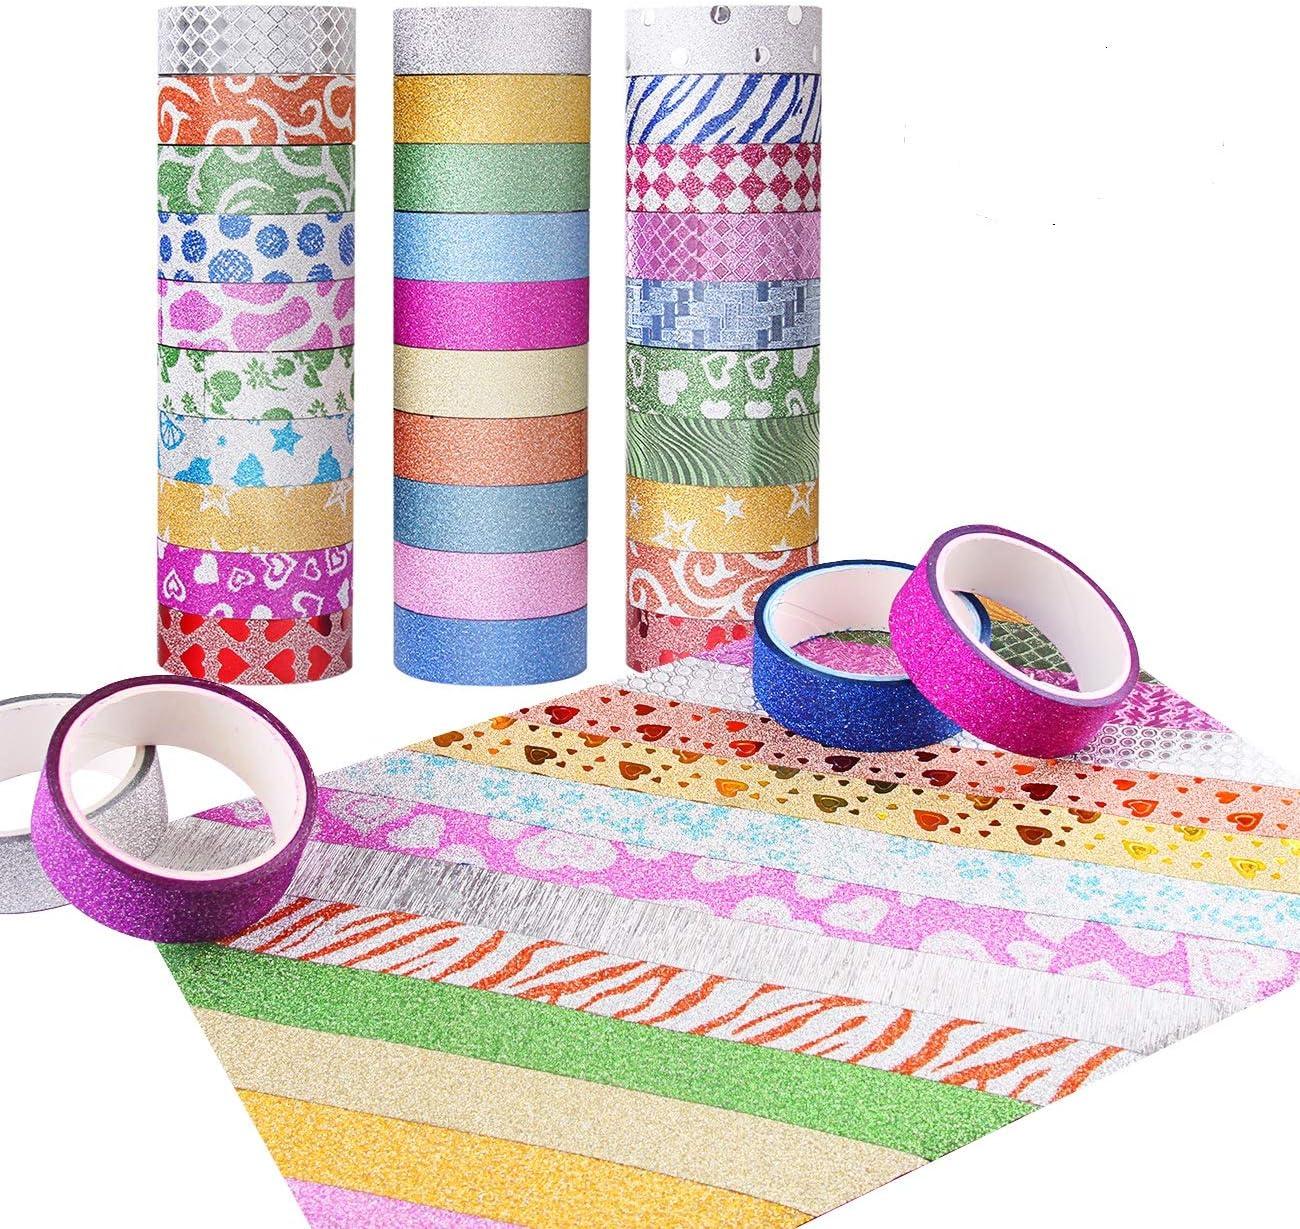 masking tape,deco tape cute tape Sweet Daisy Girl PET Tape\uff0c55mm Width Washi tape samples,washi tape